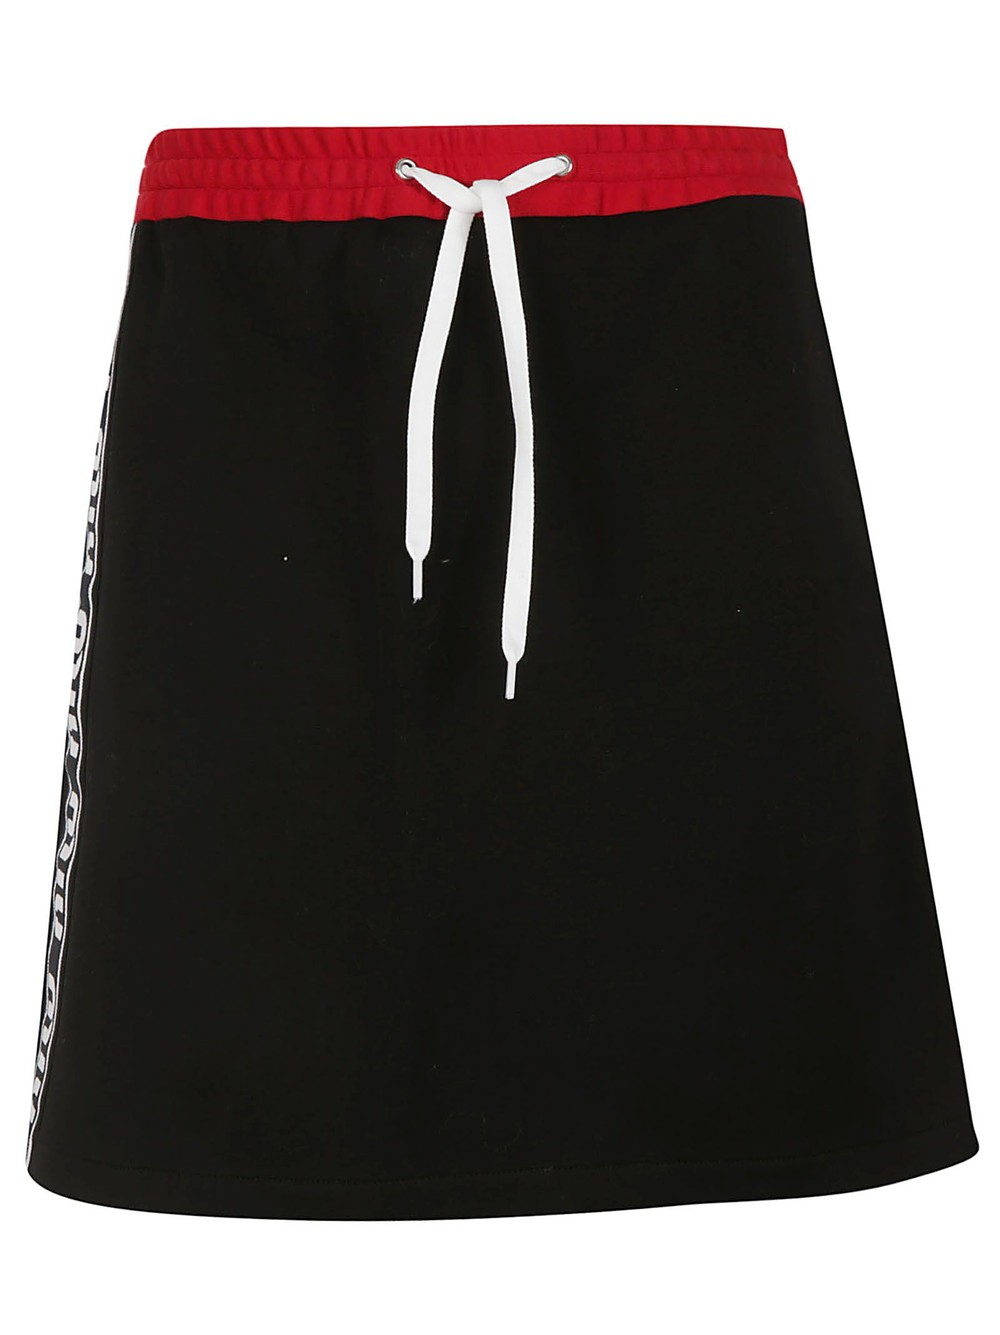 Miu Miu Logo Band Mini Skirt in black